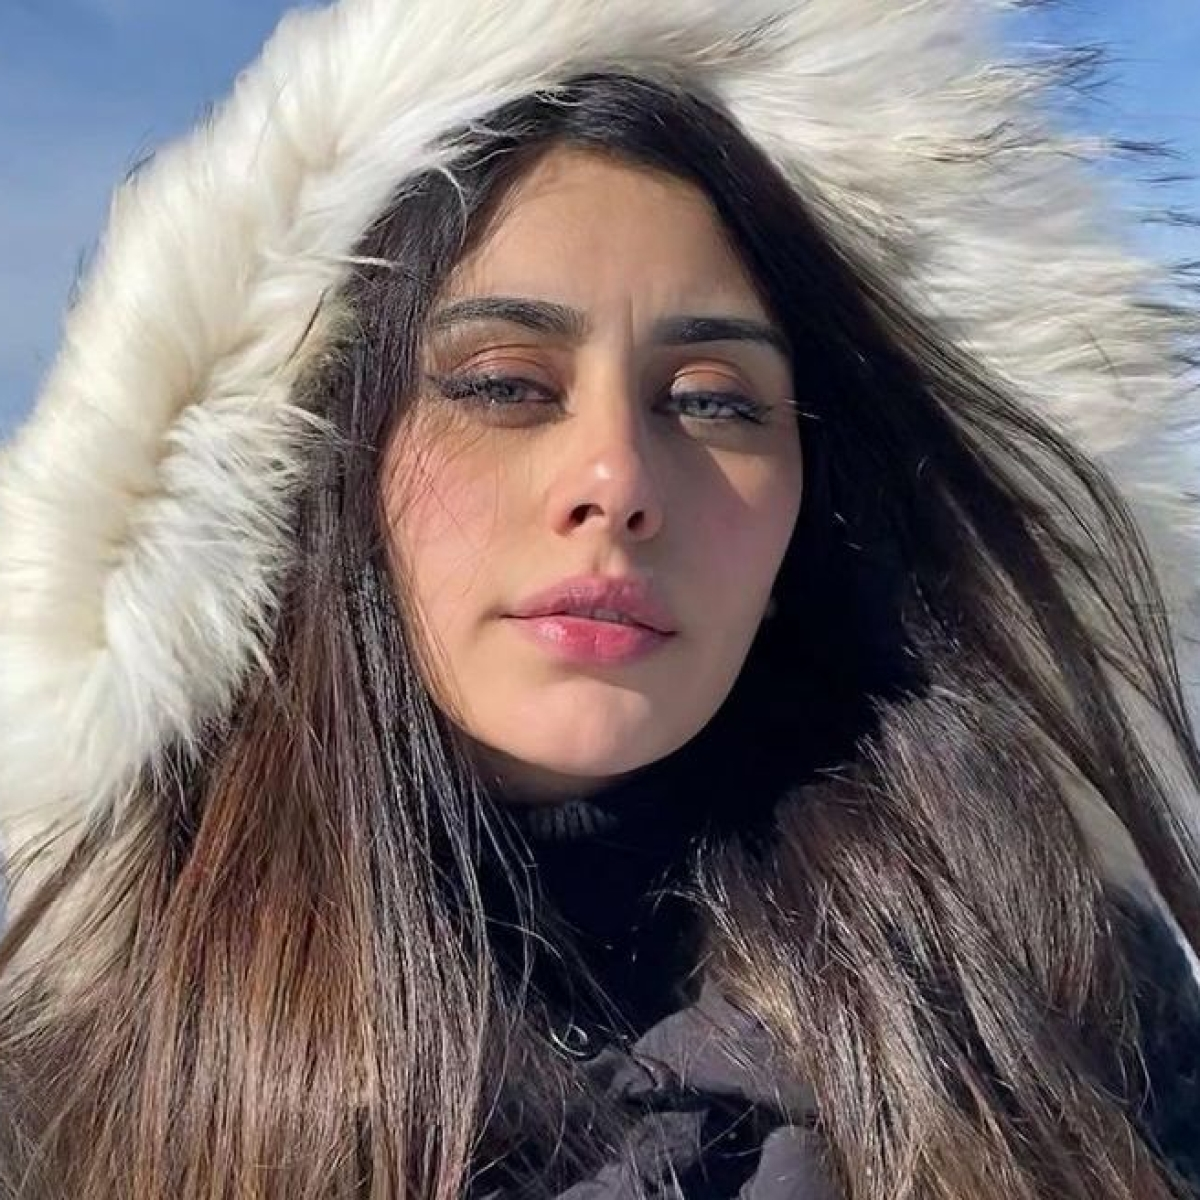 After Aamir Khan, 'Loveyatri' actress Warina Hussain quits social media